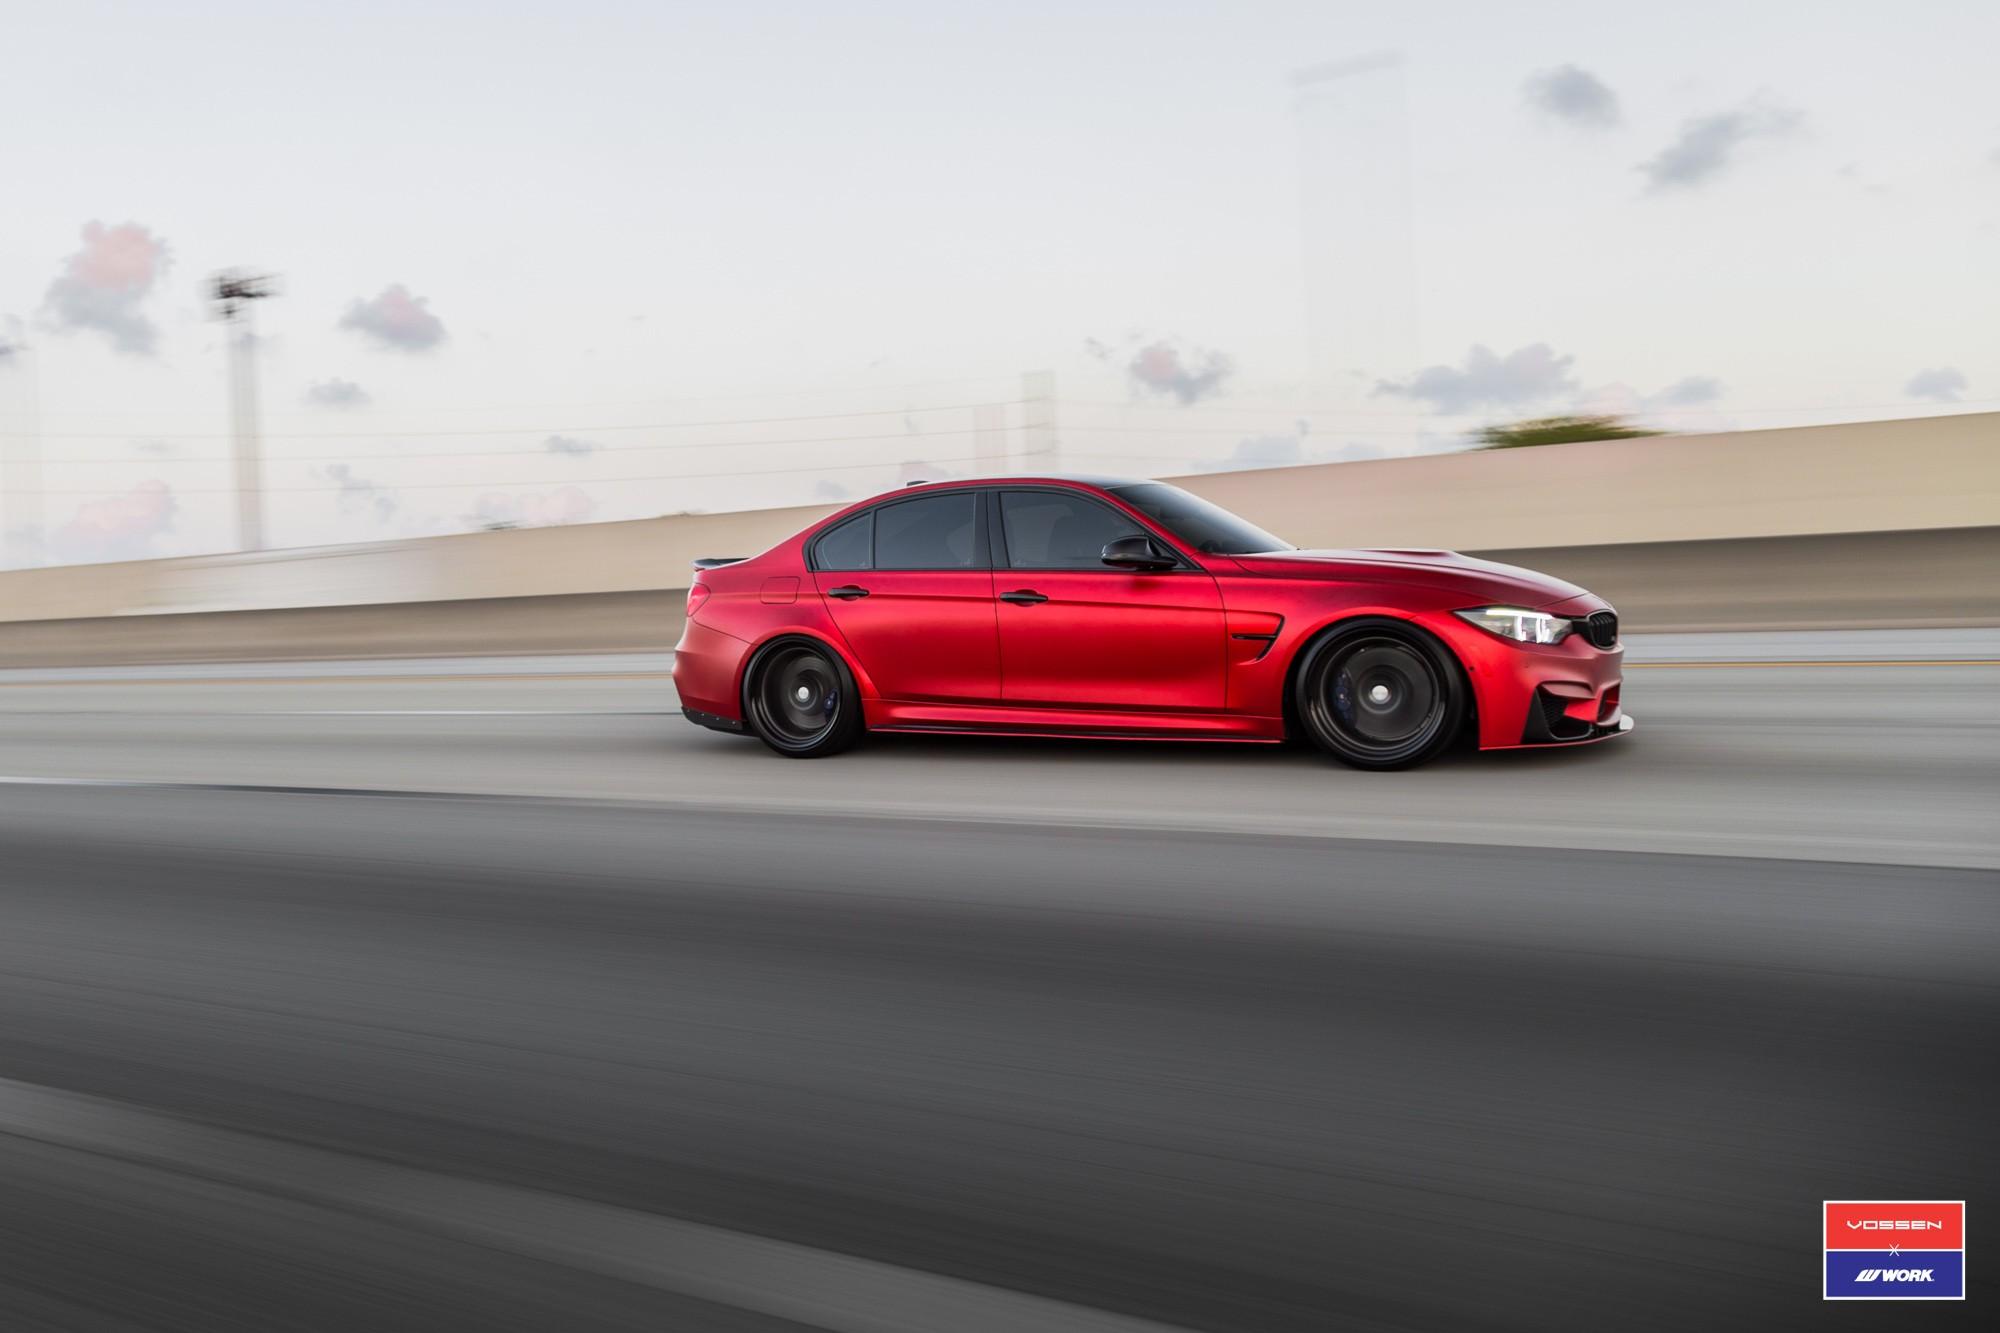 2017 Bmw M3 Facelift In Red Gets Custom Vossen Wheels Autoevolution